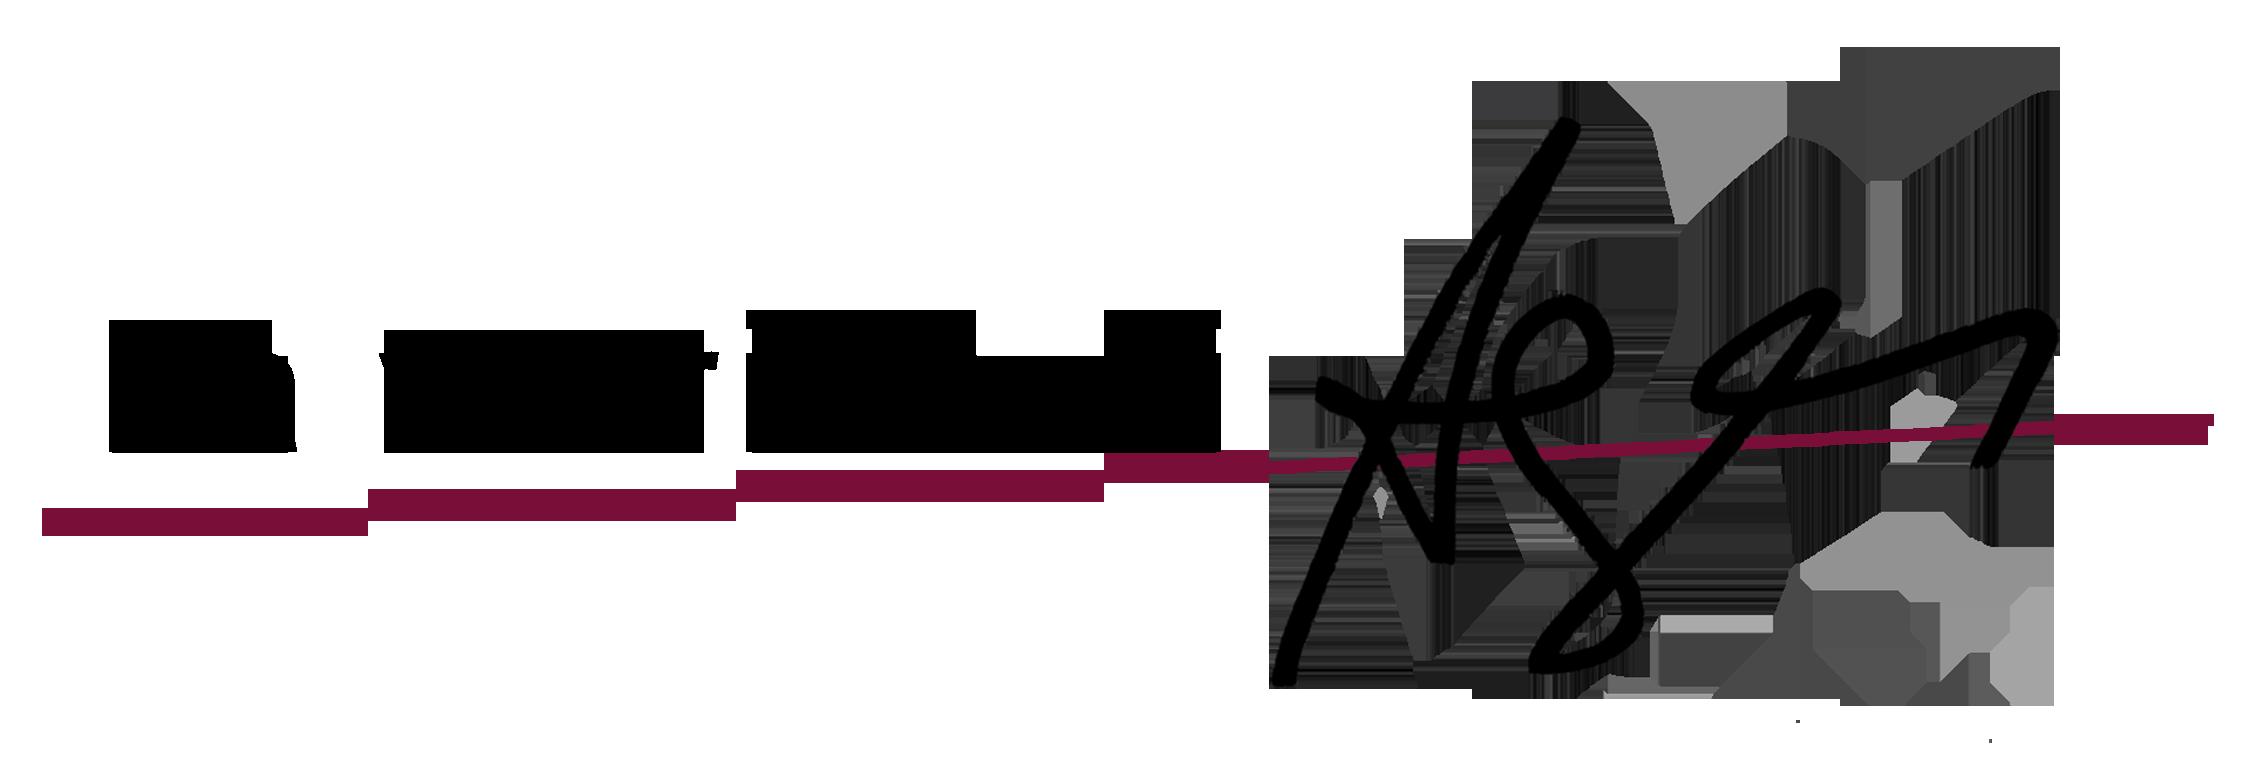 agar-logo-3